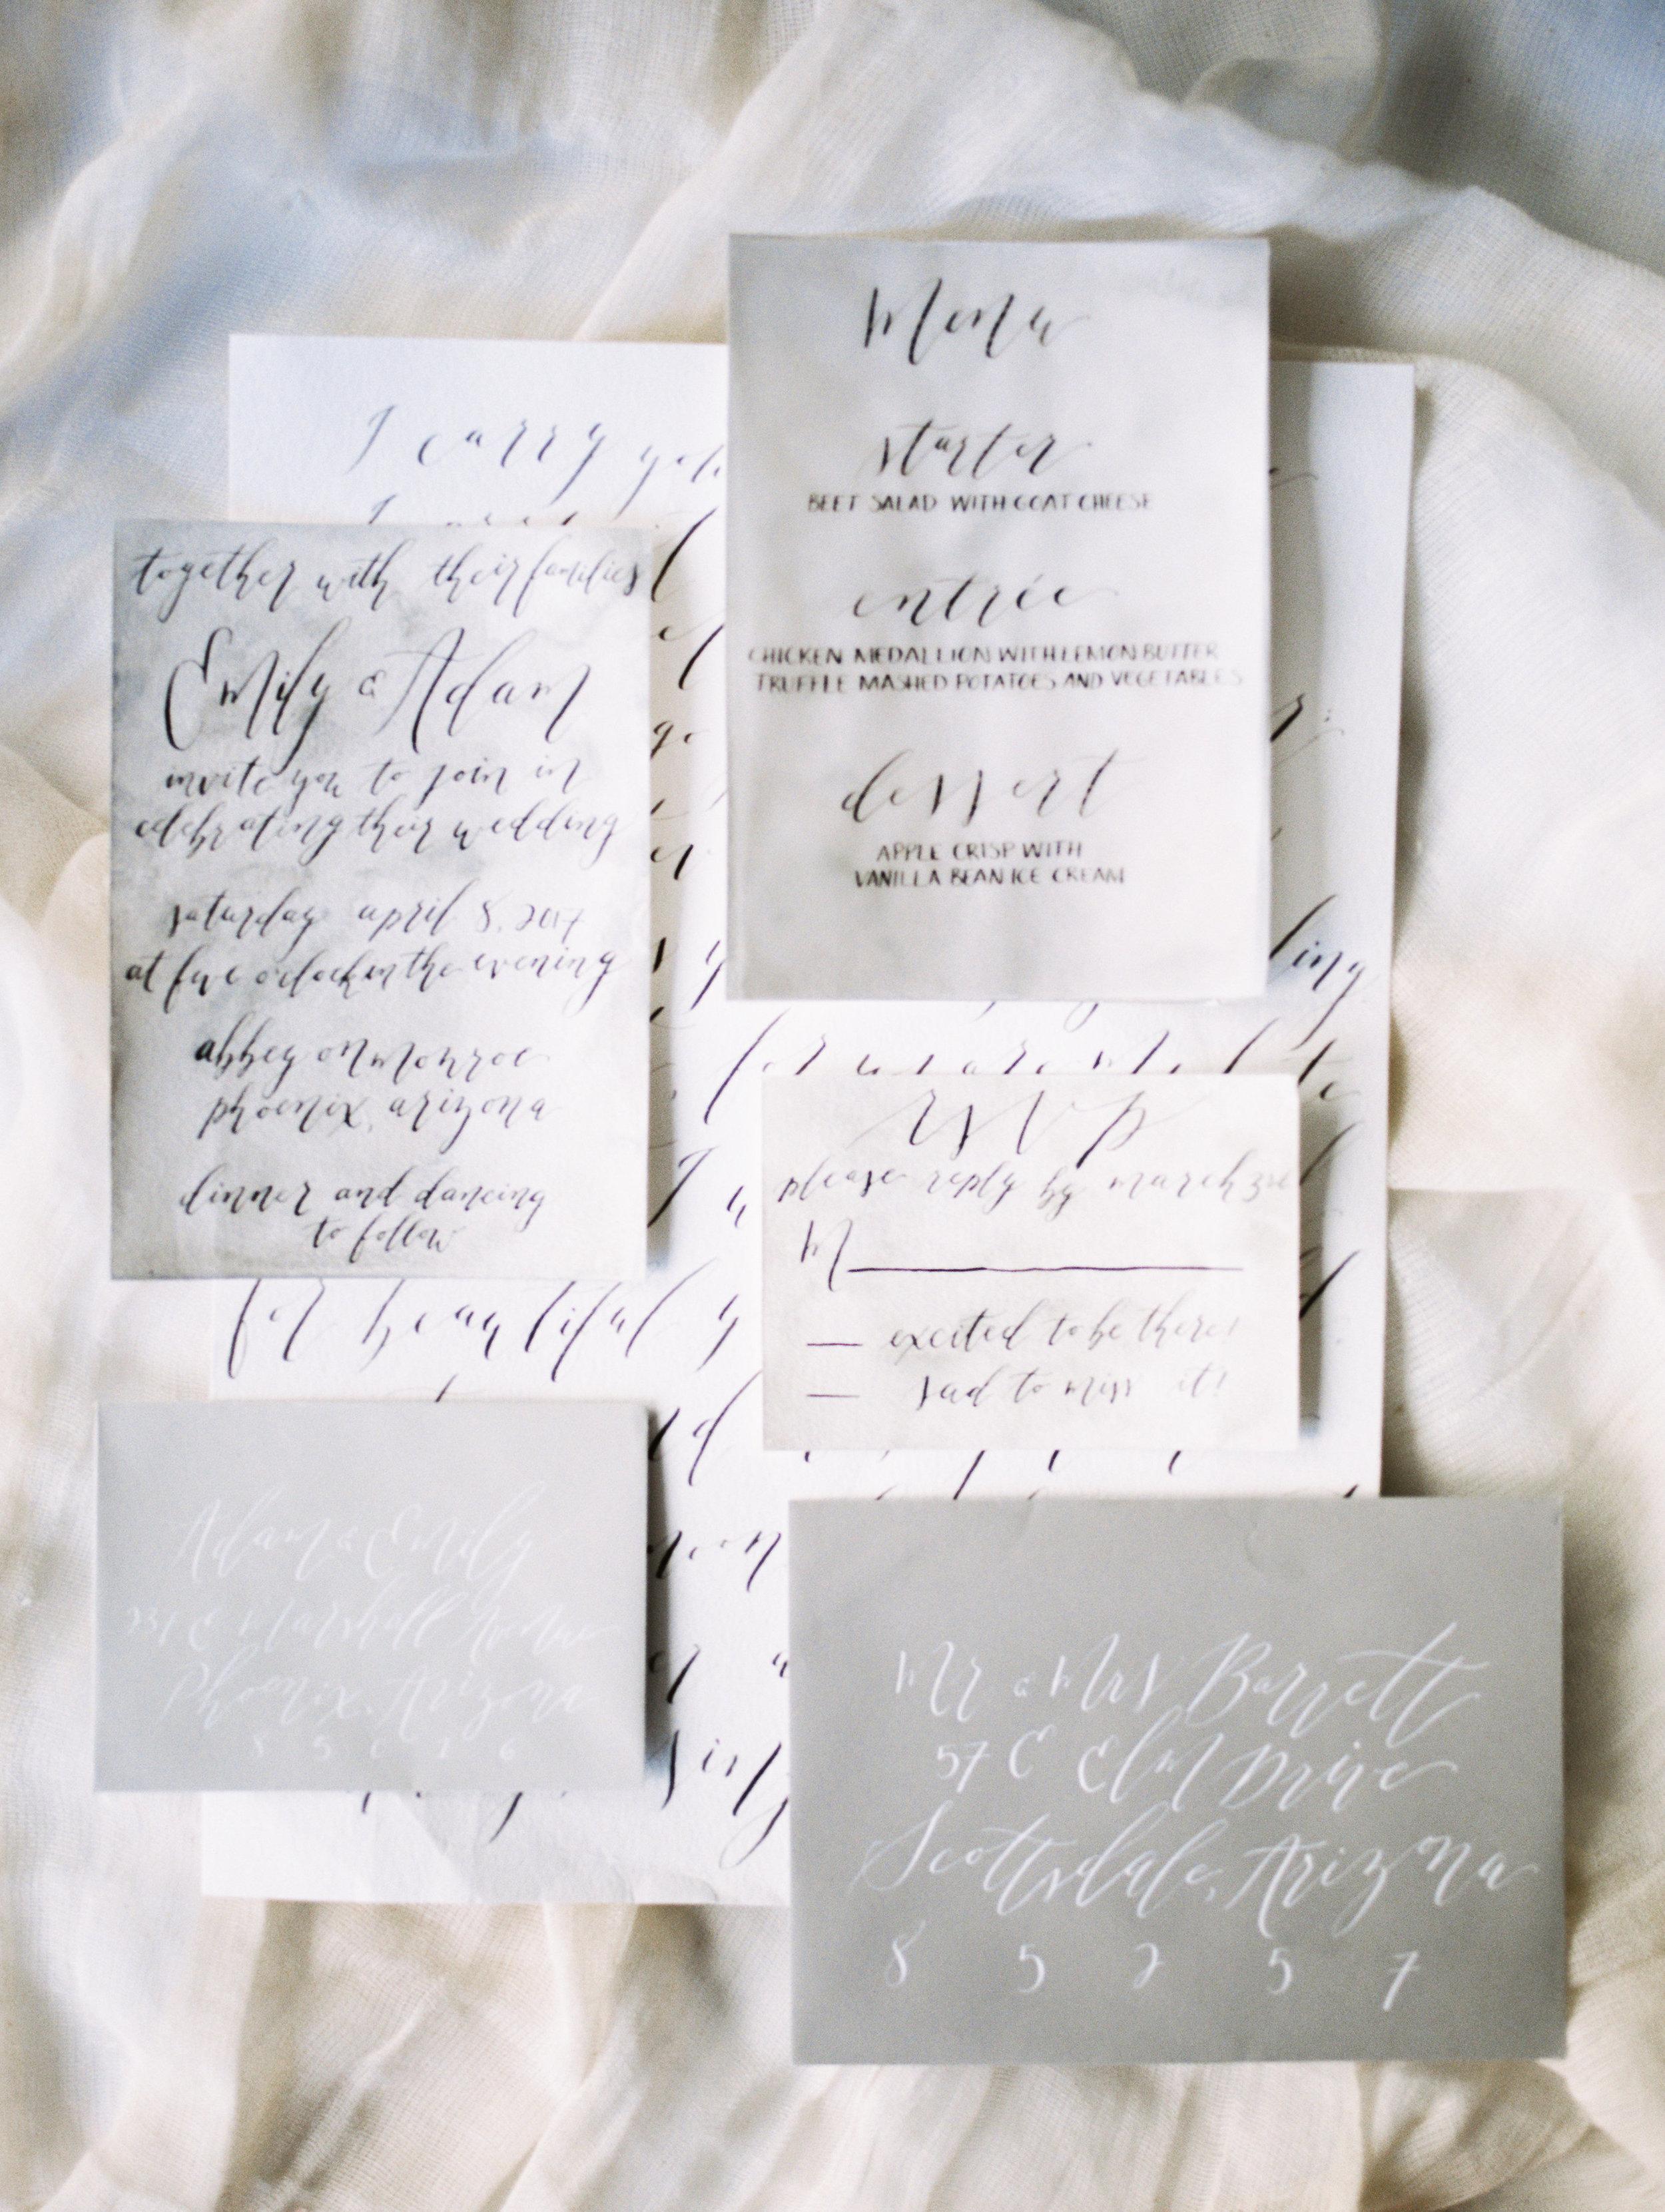 CustomInvitationSuite-WeddingInvitation-ModernCalligraphy-TrueNorthPaperCo-PeachesandTwine.JPG